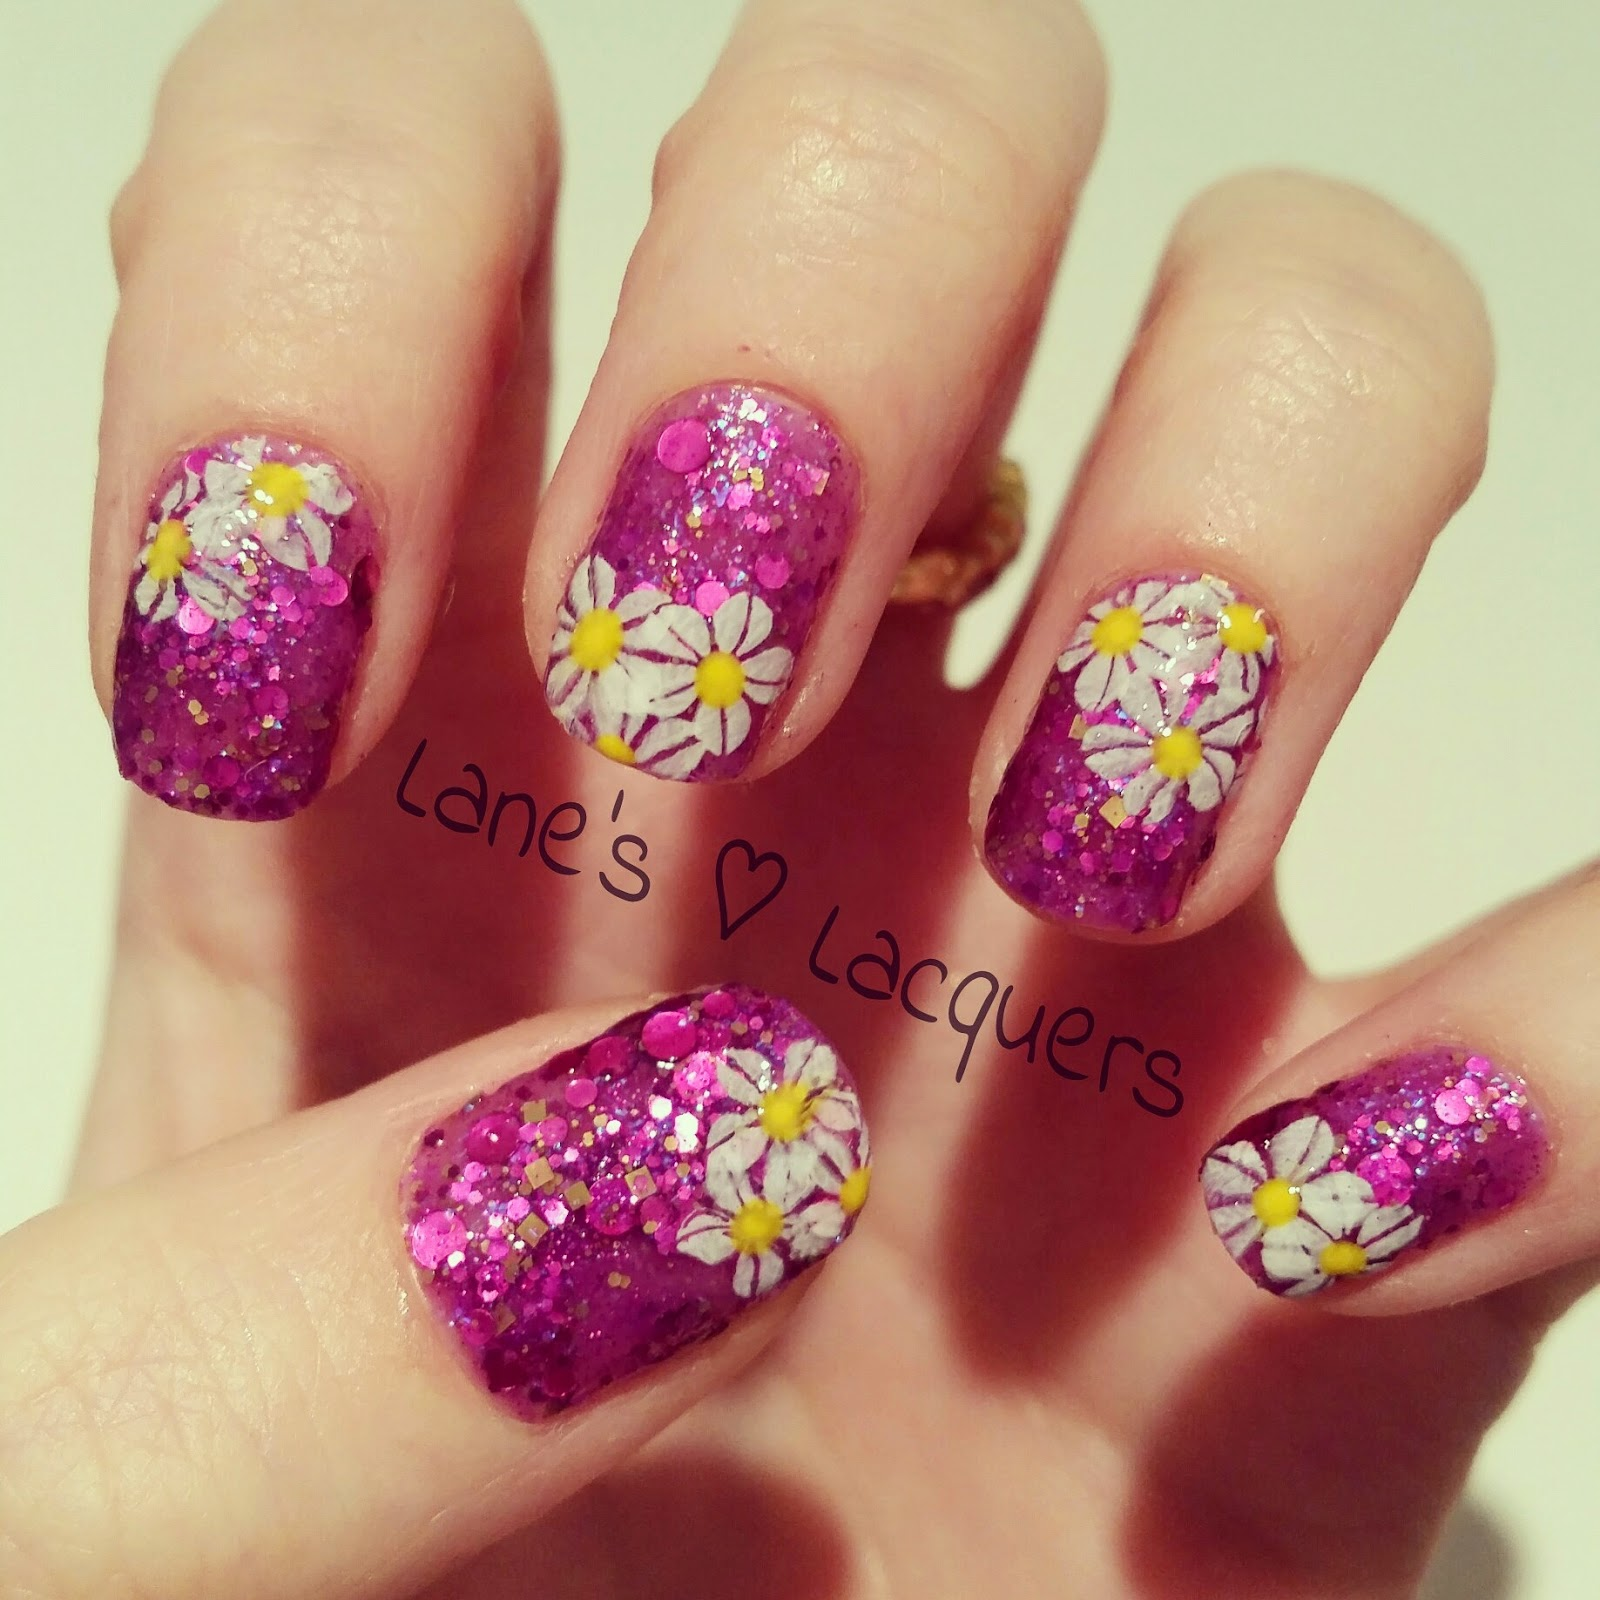 hare-polish-anemone-gardens-flower-nail-art